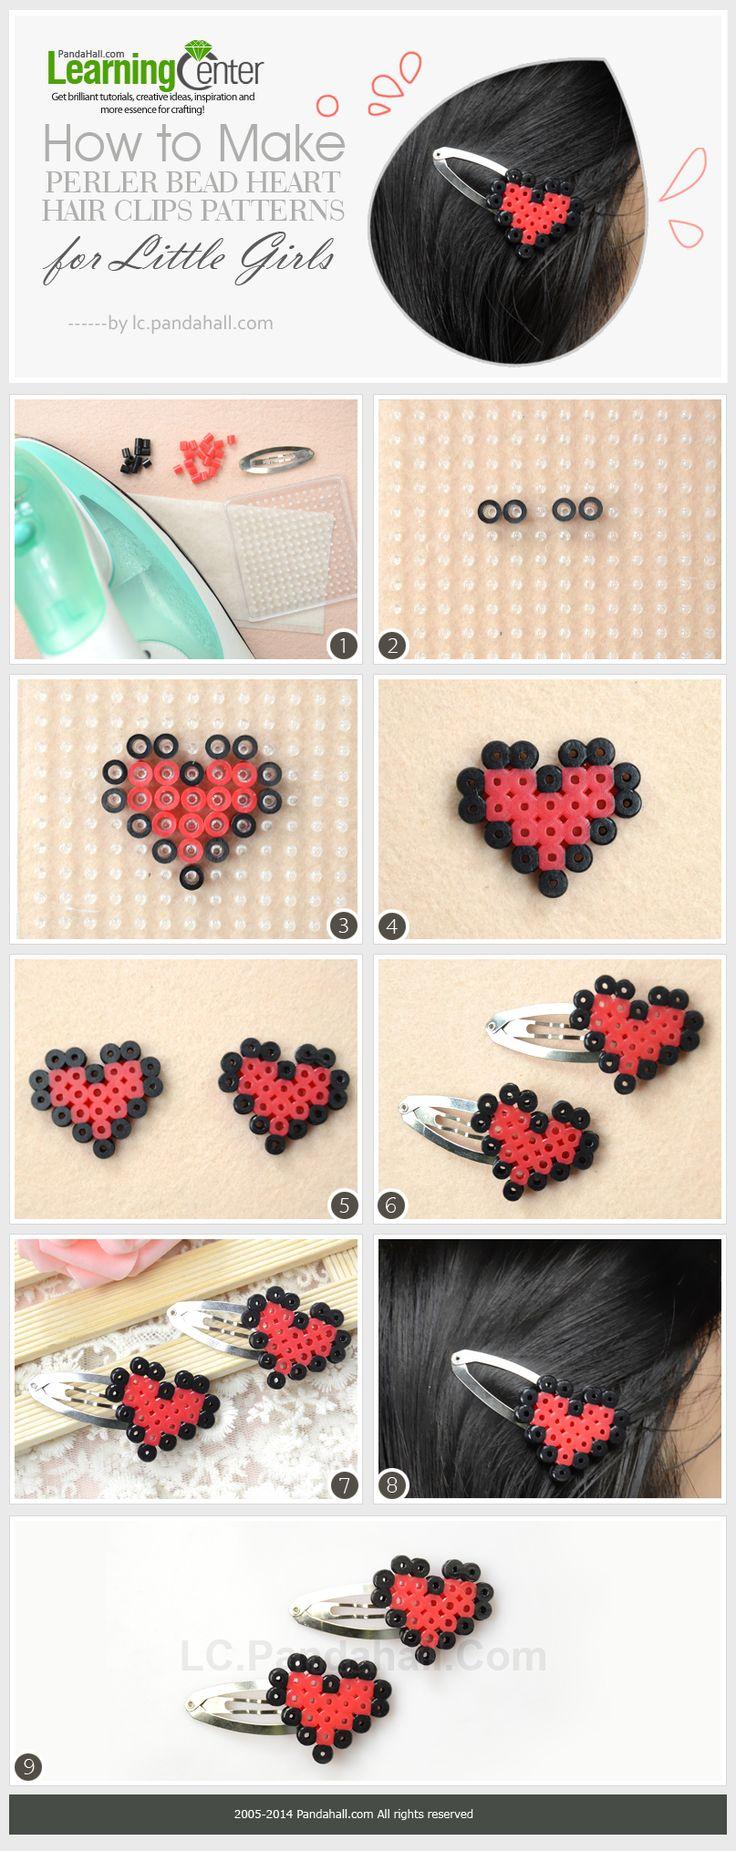 How to Make Perler Bead Heart Hair Clips Patterns for Little Girls